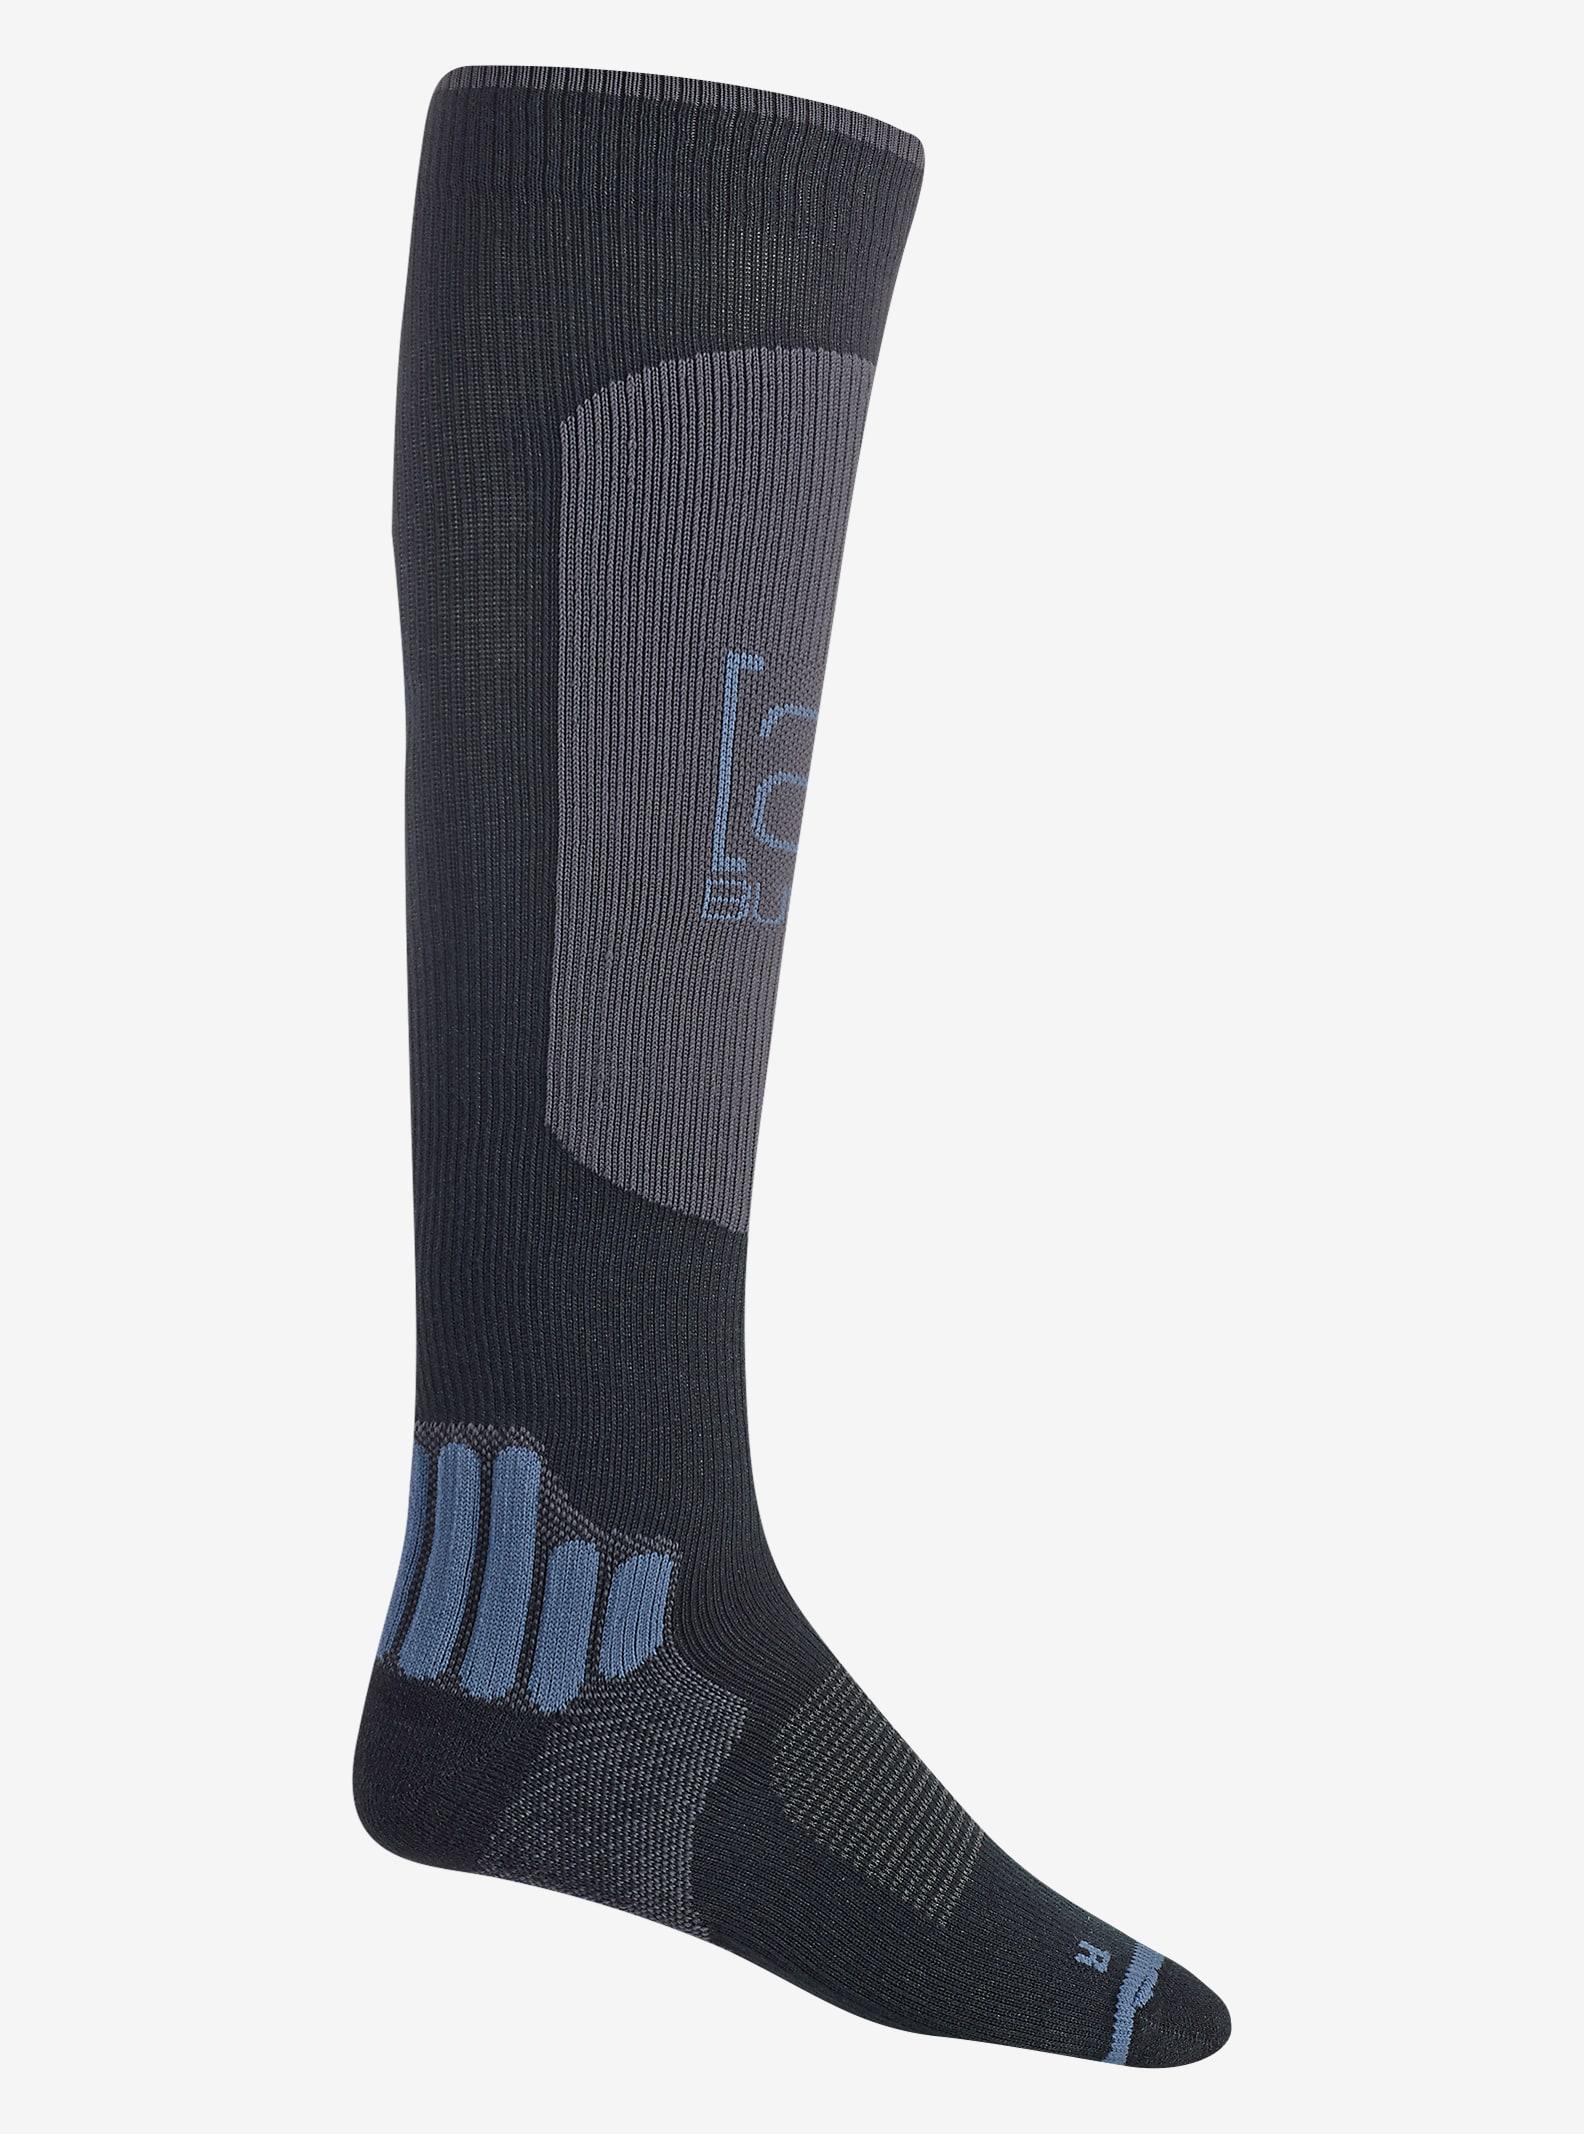 Burton [ak] Endurance Sock shown in True Black